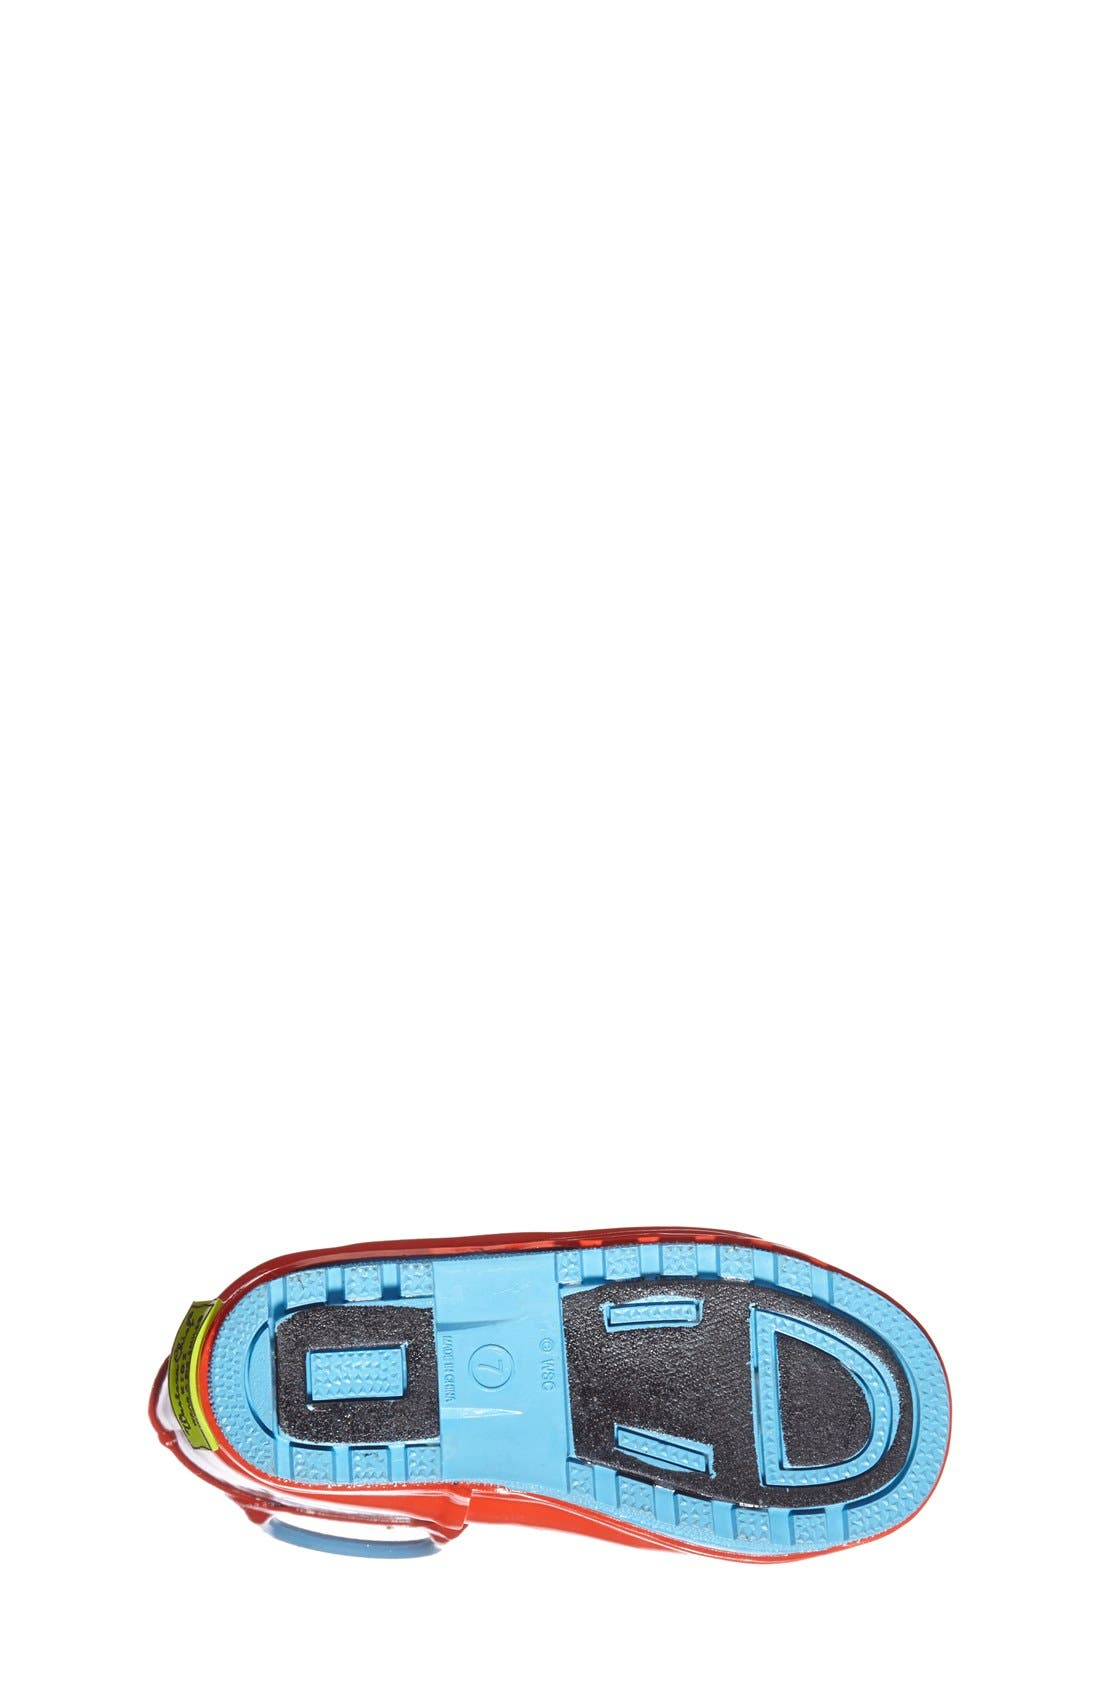 WESTERN CHIEF,                             'Thomas the Tank Engine<sup>®</sup>' Rain Boot,                             Alternate thumbnail 2, color,                             421